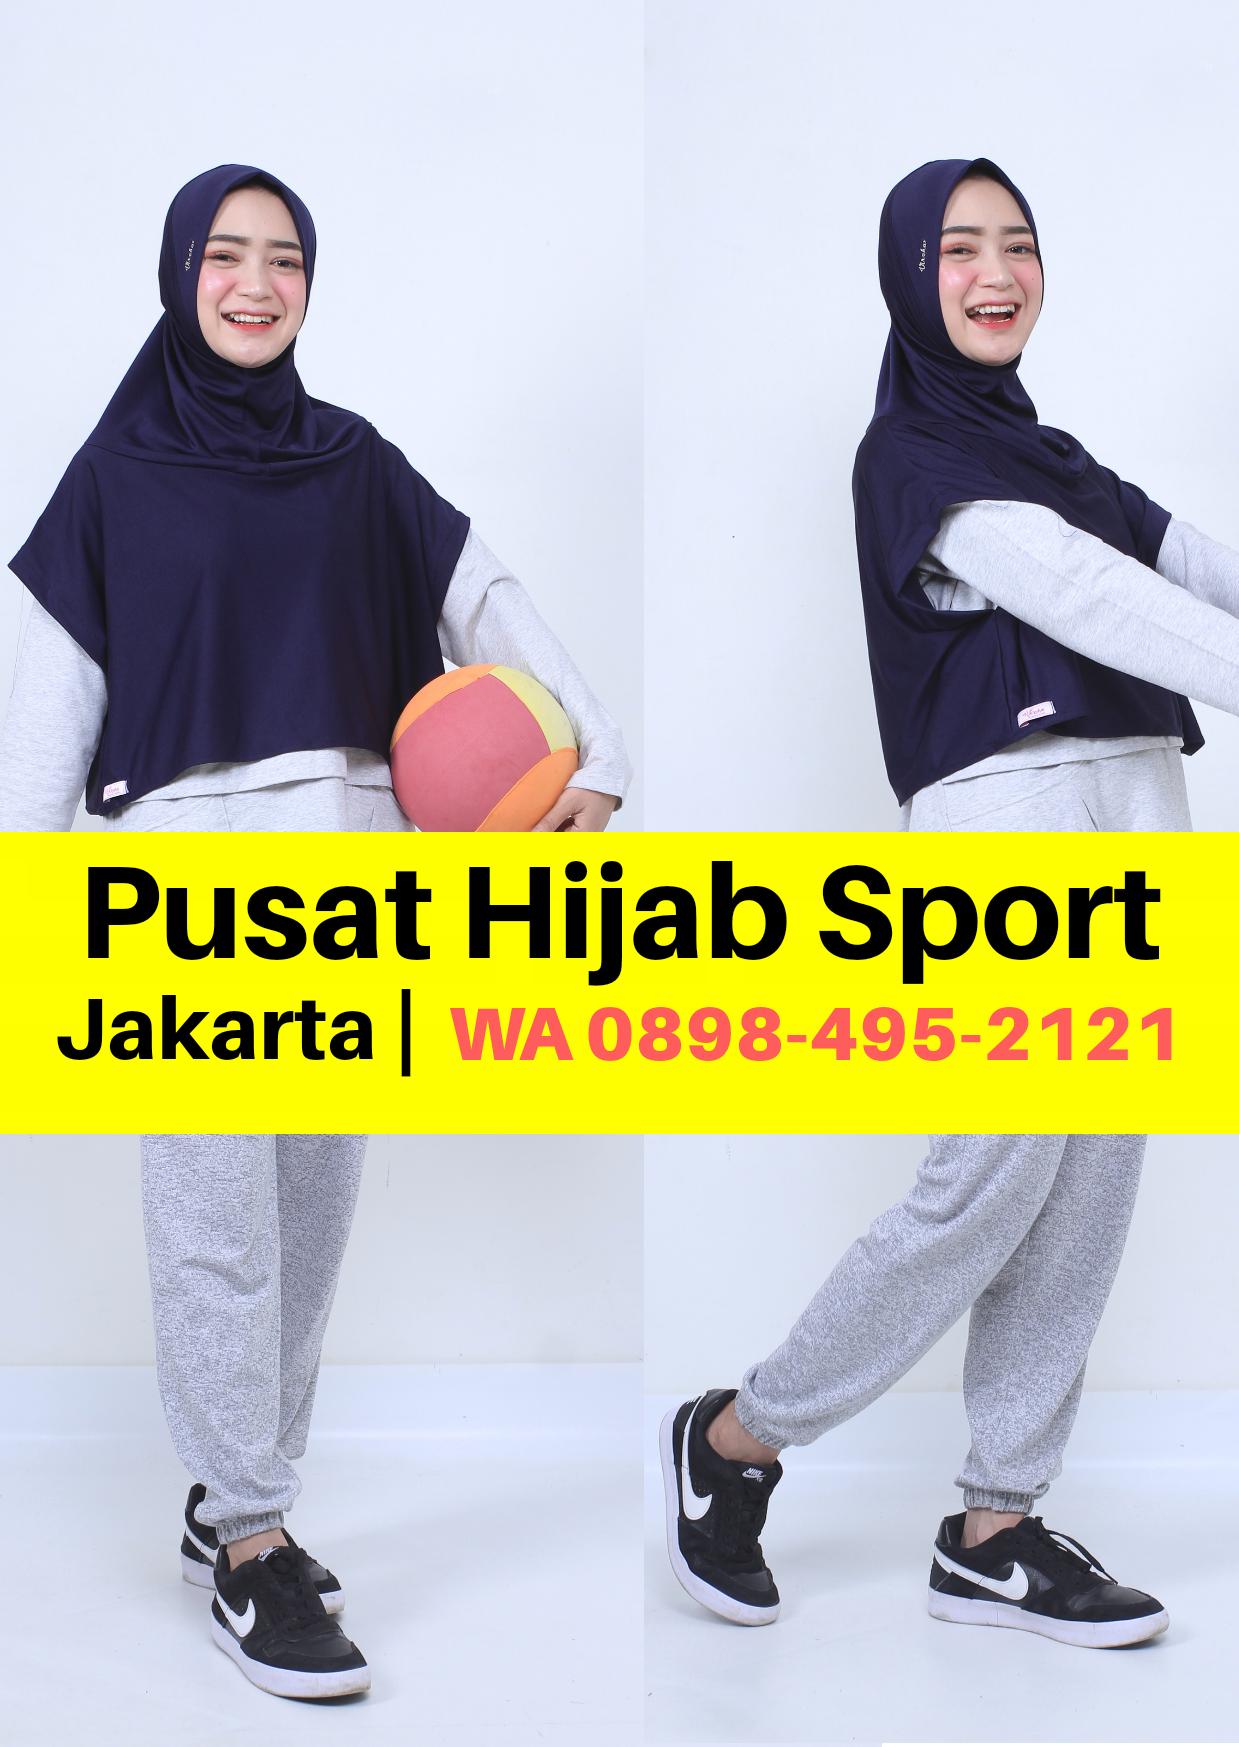 Kualitas Premium Telp Wa 0898 495 2121 Online Shop Hijab Sport Hijab Sport Olahraga Di Jakarta Hijab Jakarta Sports